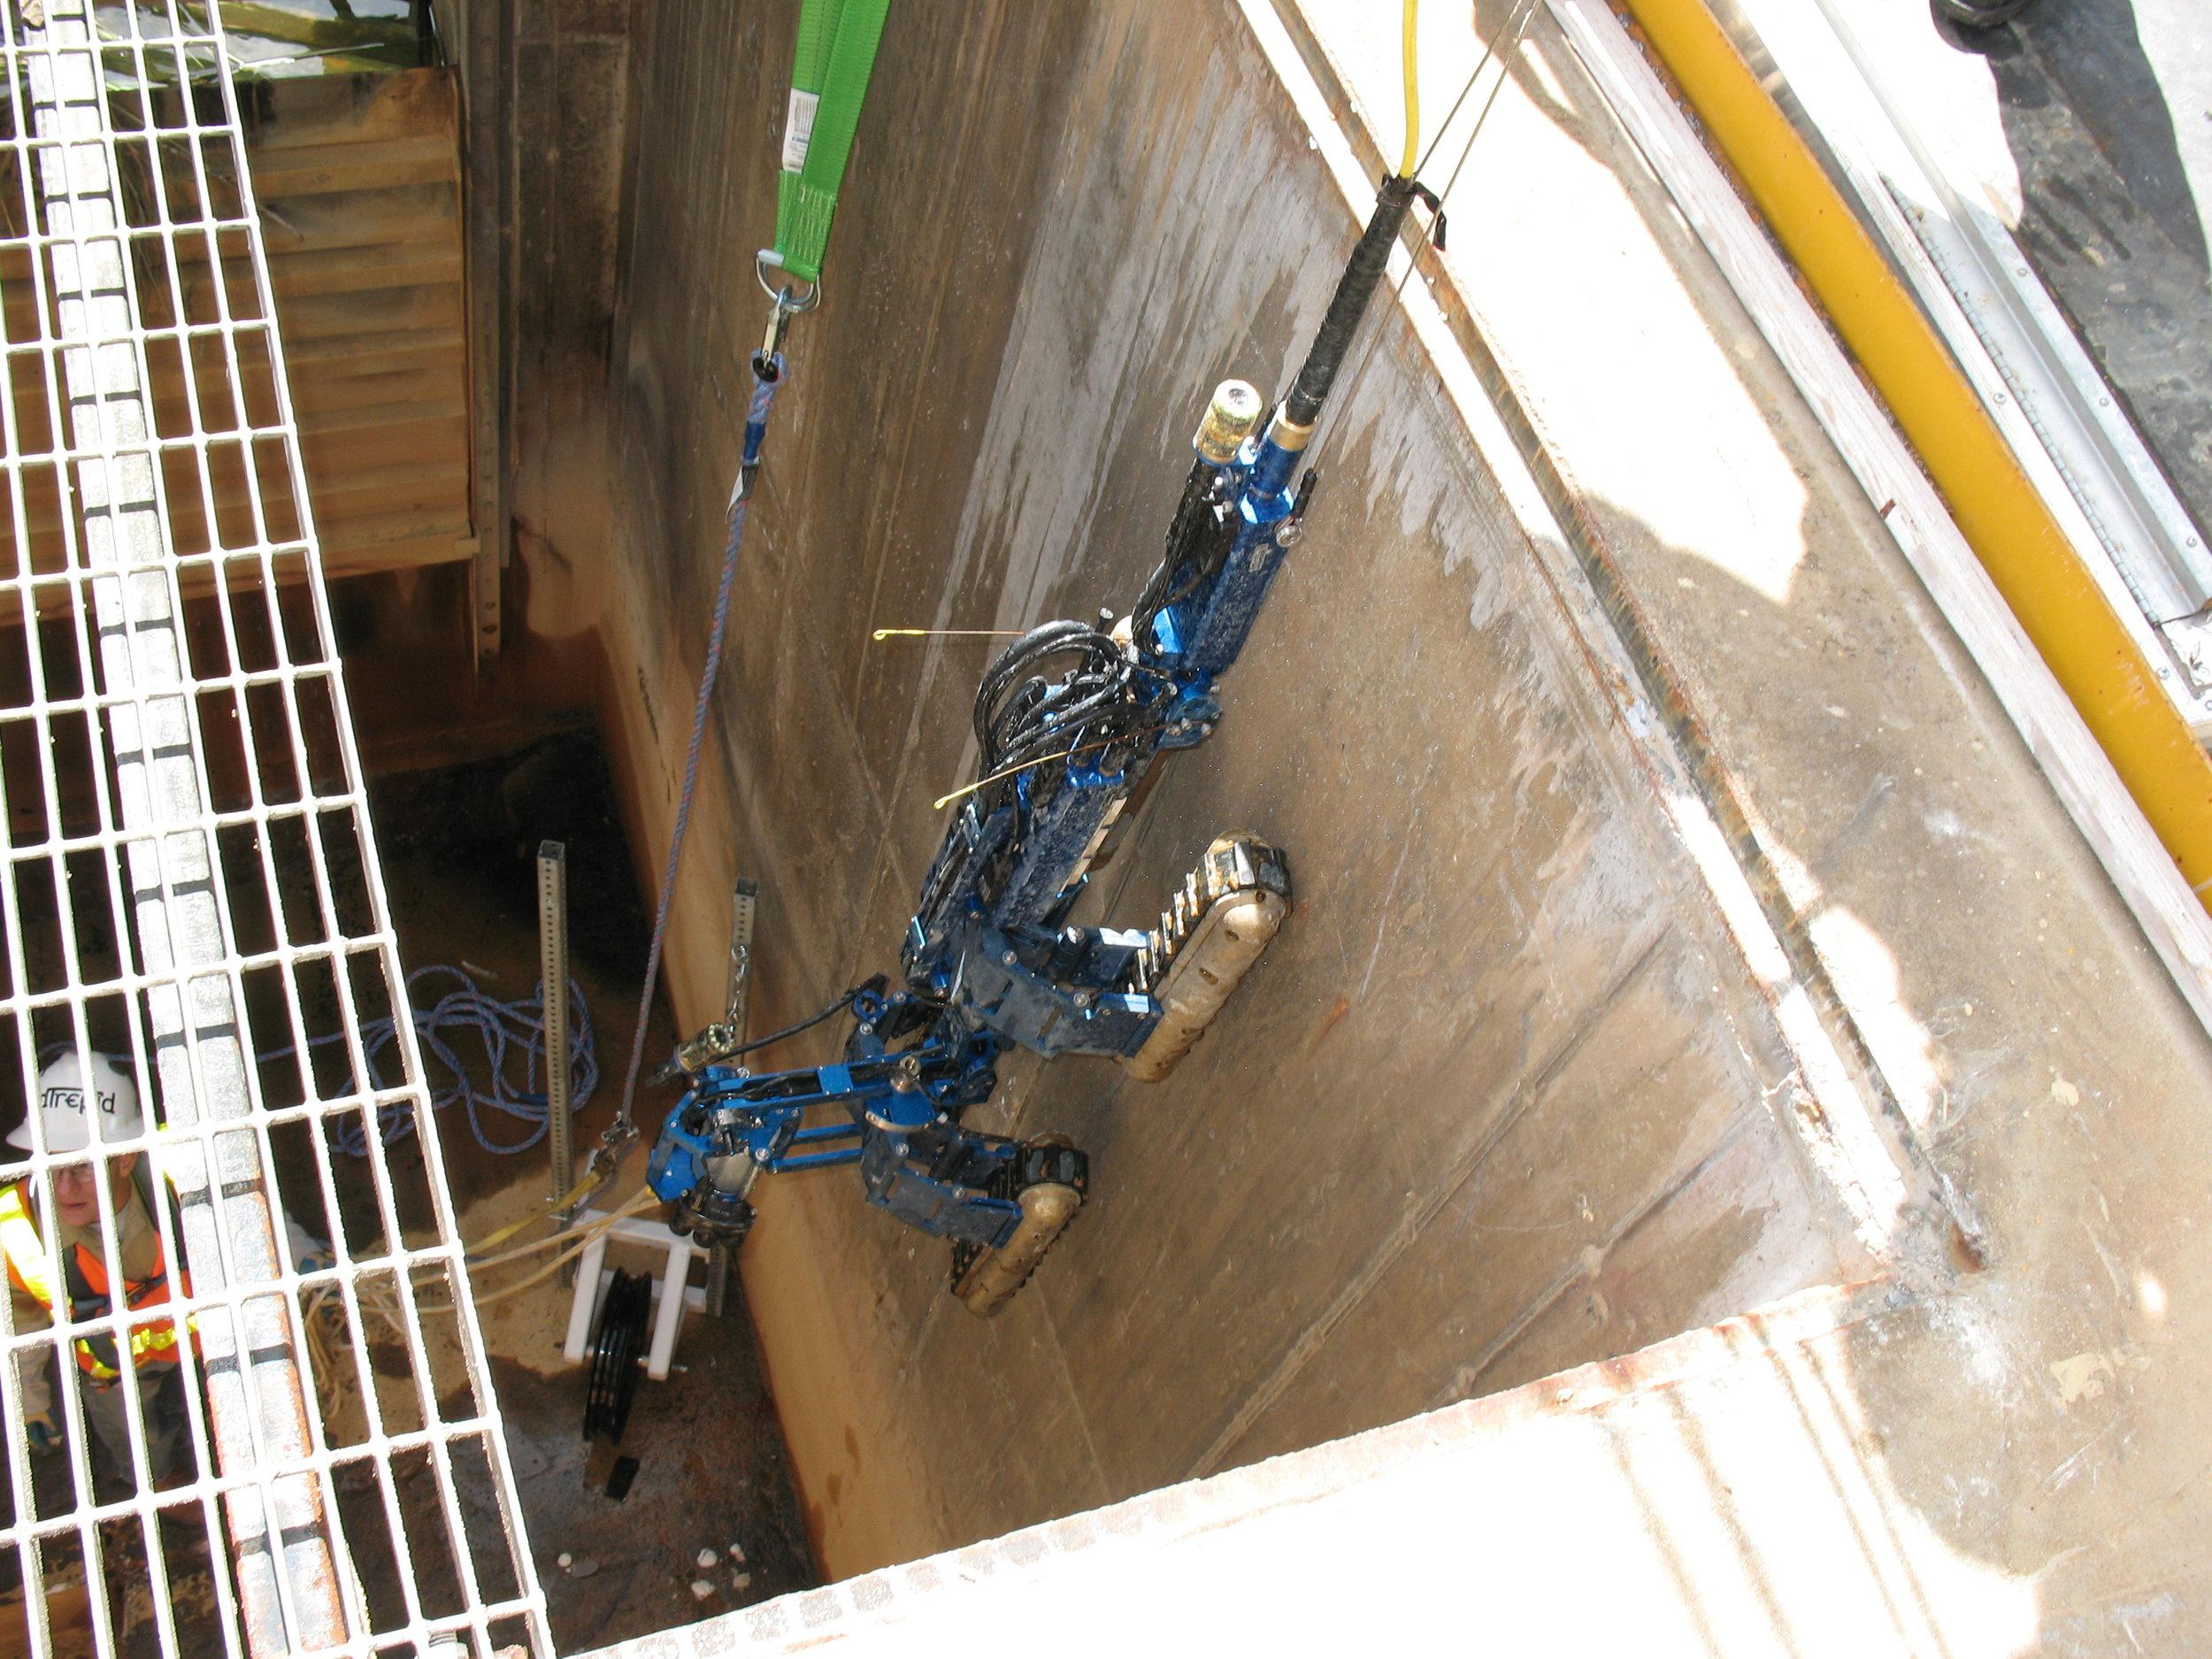 Inuktun Versatrax 300™ Long Range Pipe Inspection Vehicle